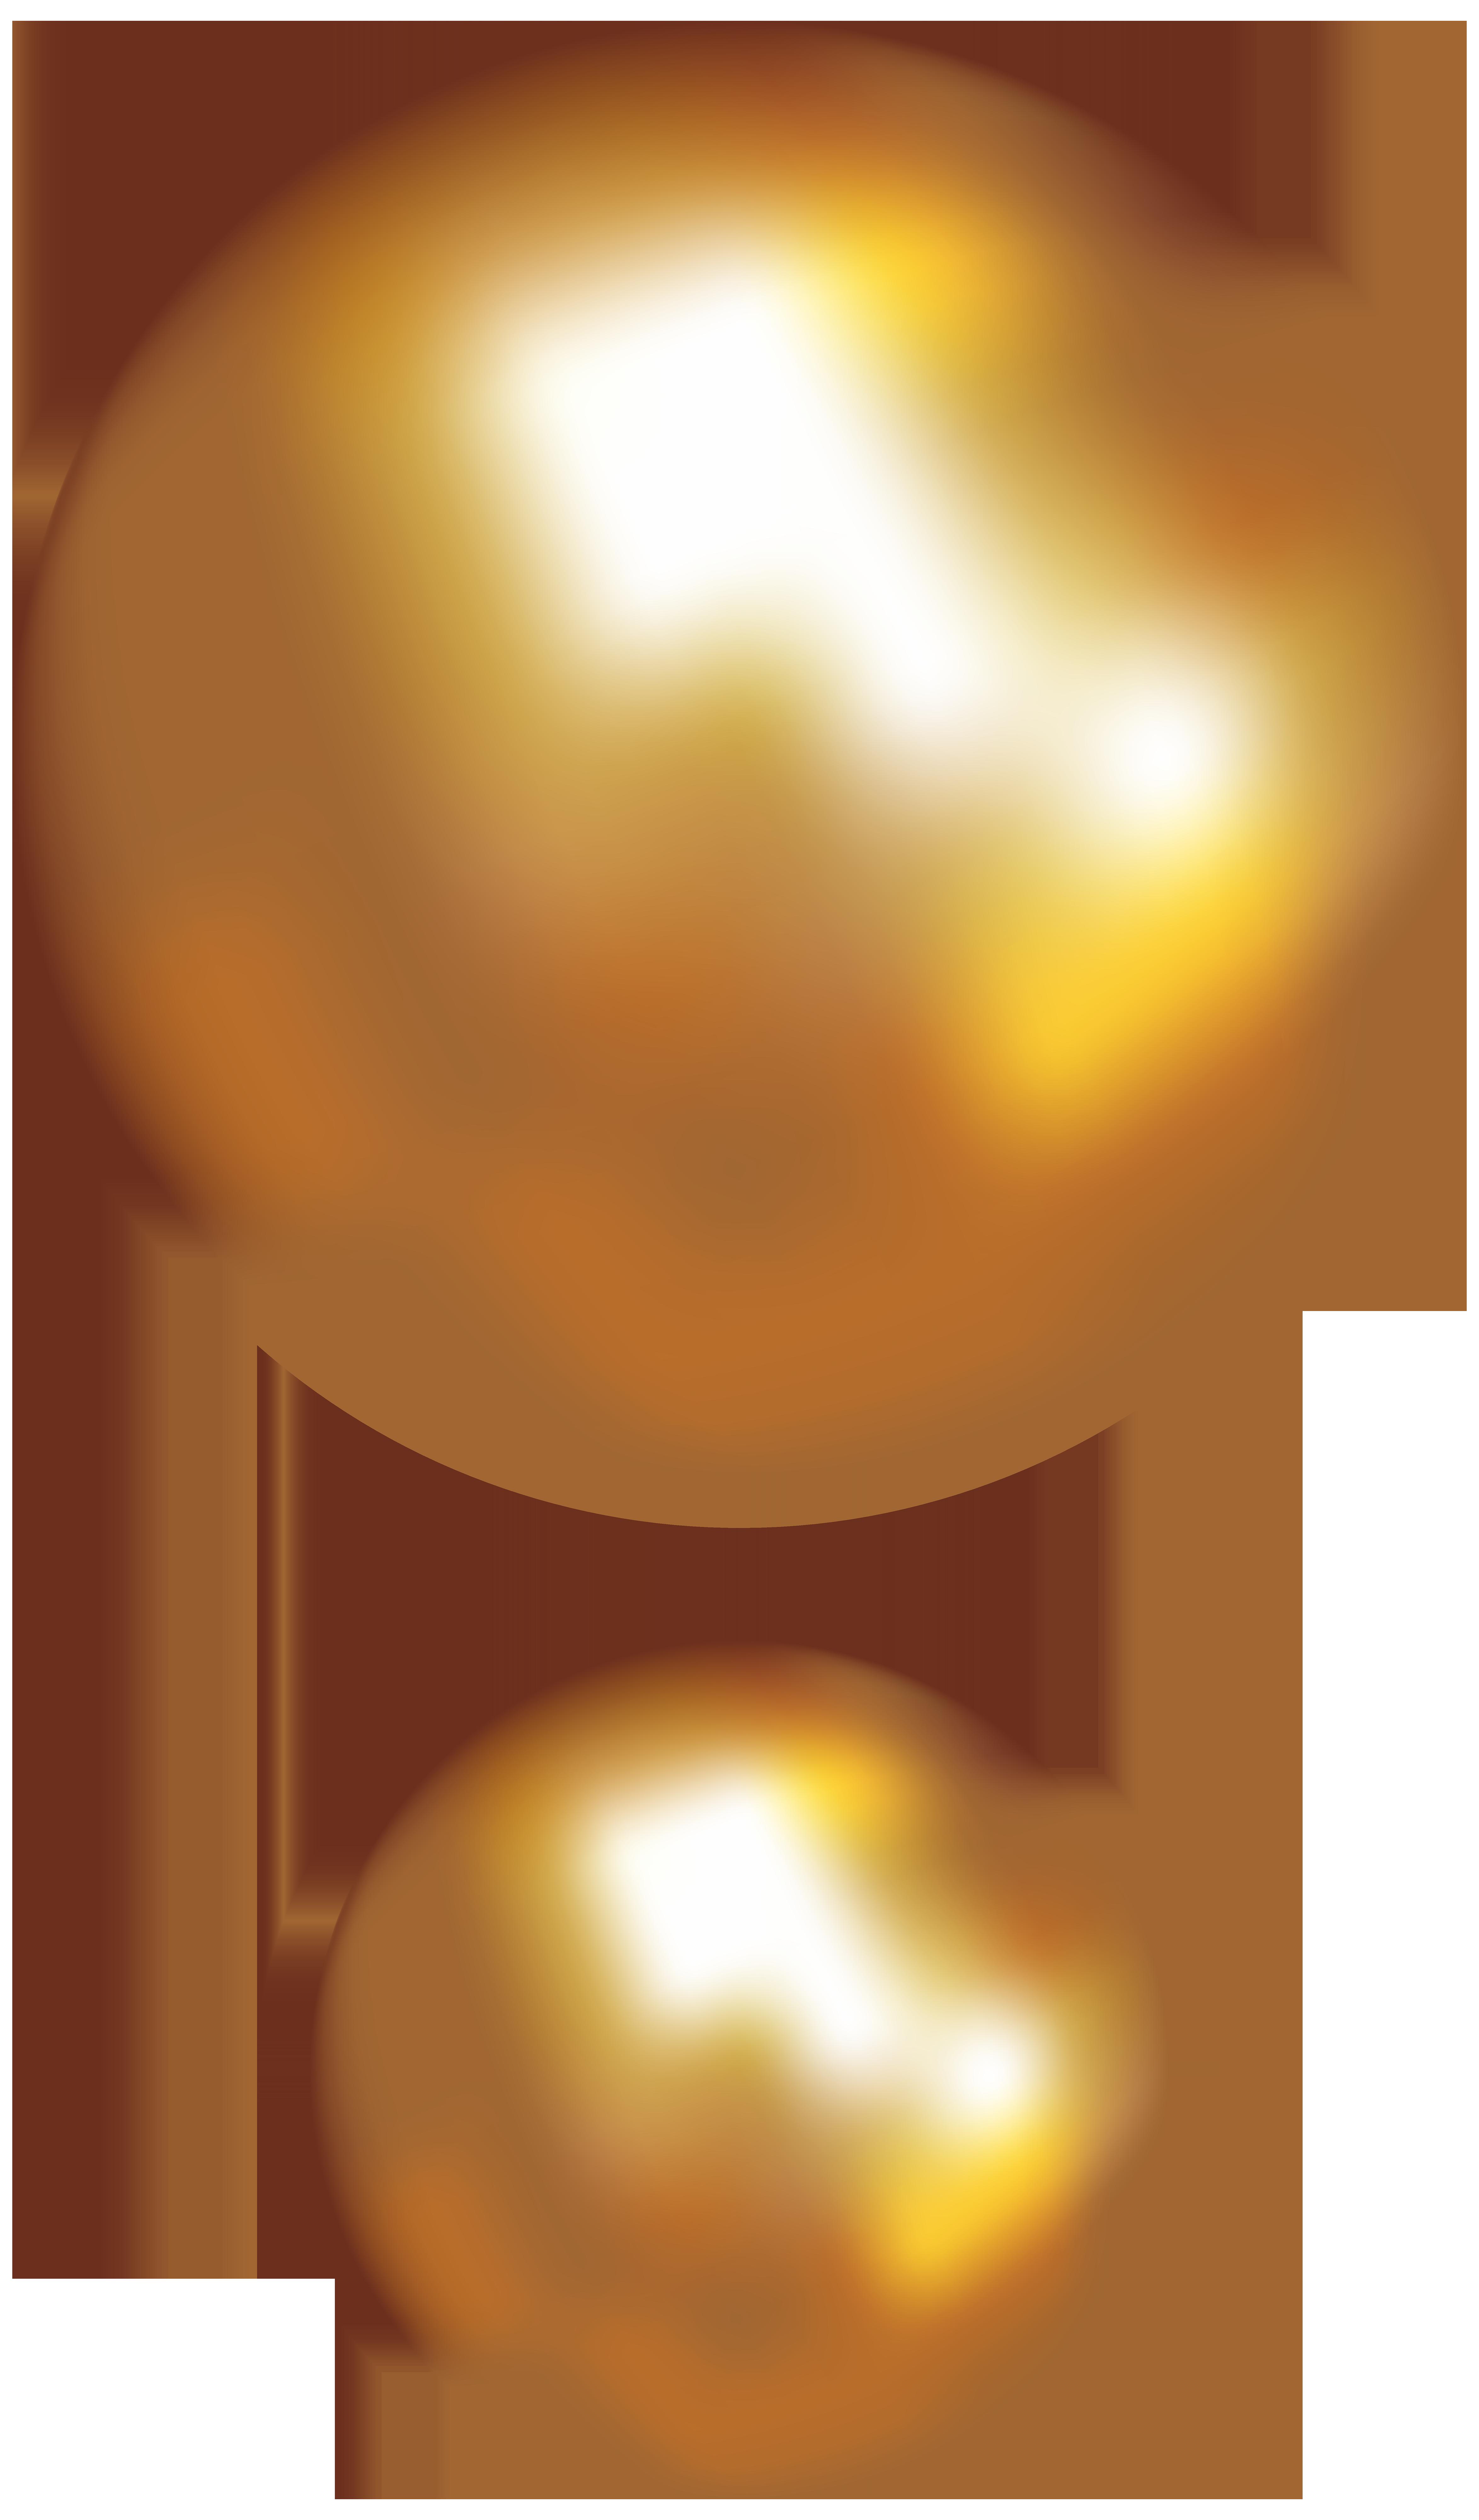 4695x8000 Gold Pearls Transparent Clip Art Imageu200b Gallery Yopriceville